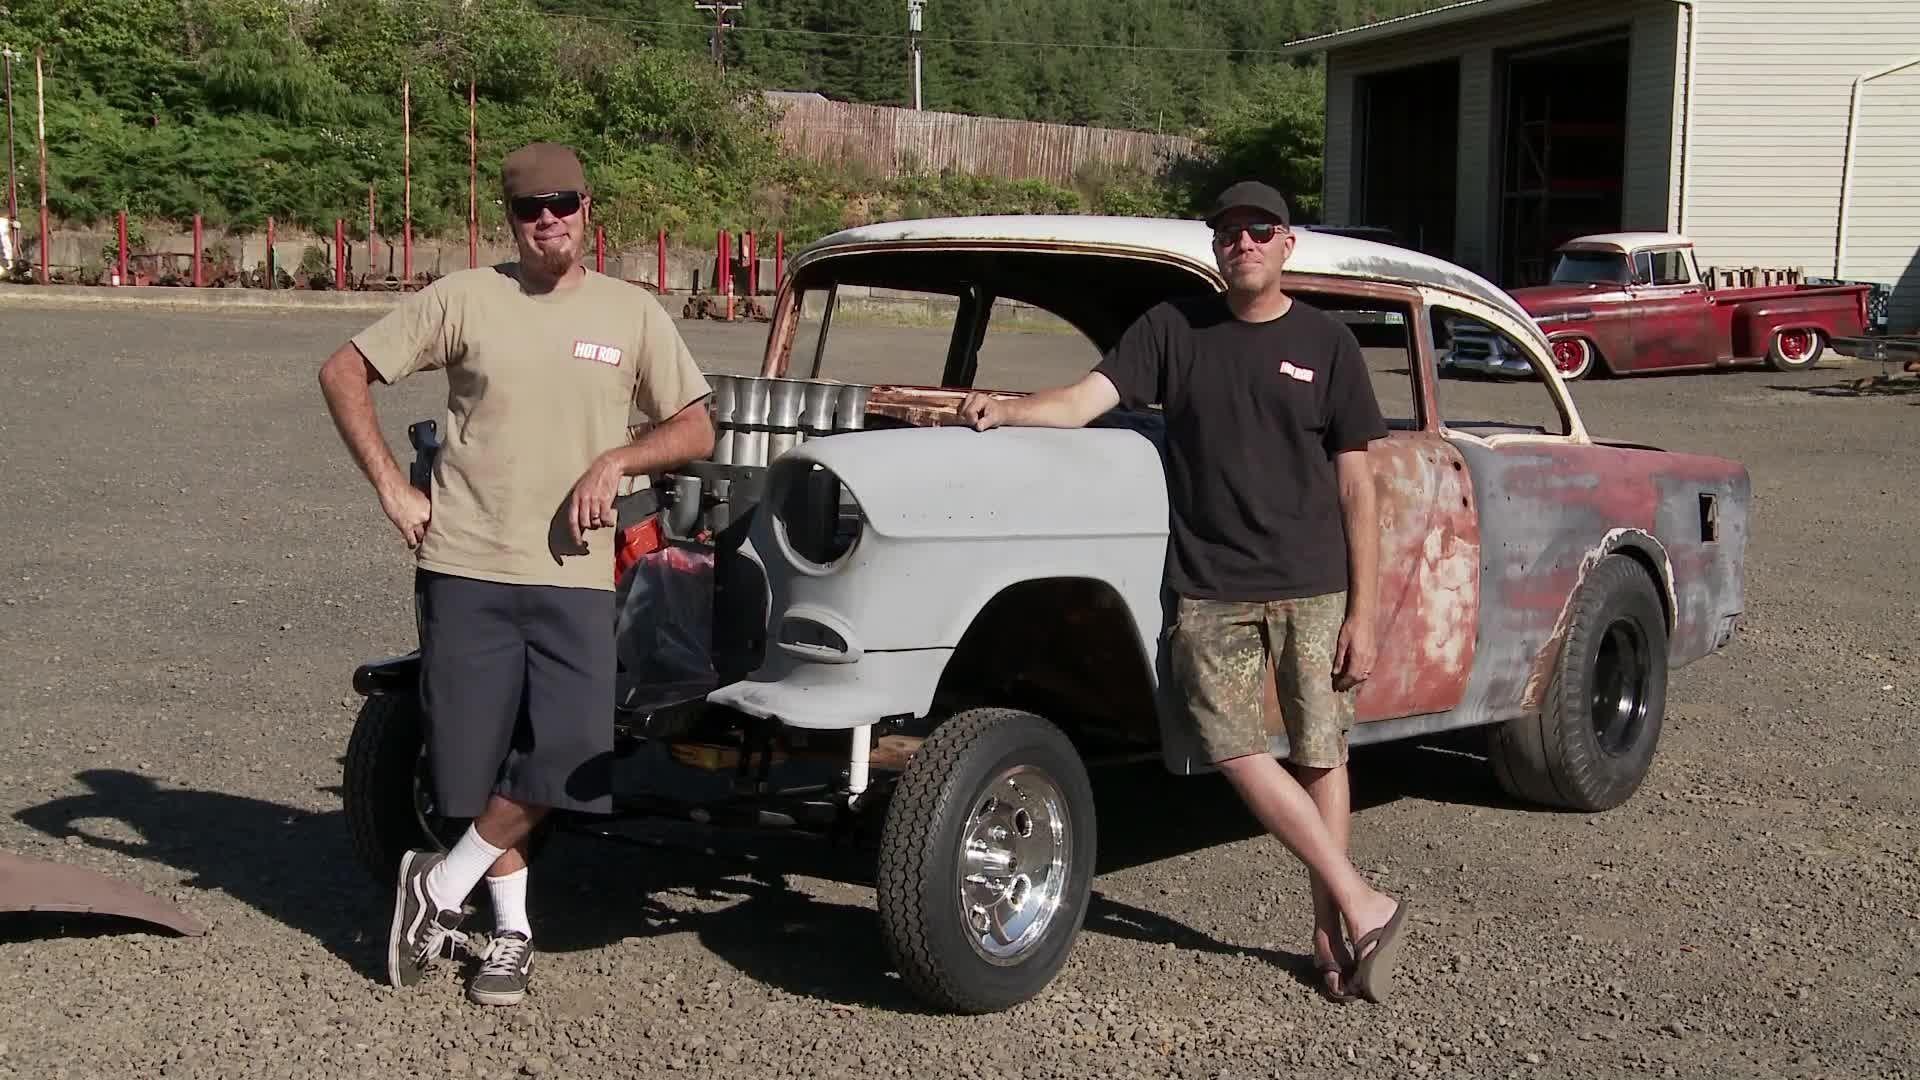 1955 Chevy Gasser - Blasphemi - Roadkill | Rat-icle Rides ...